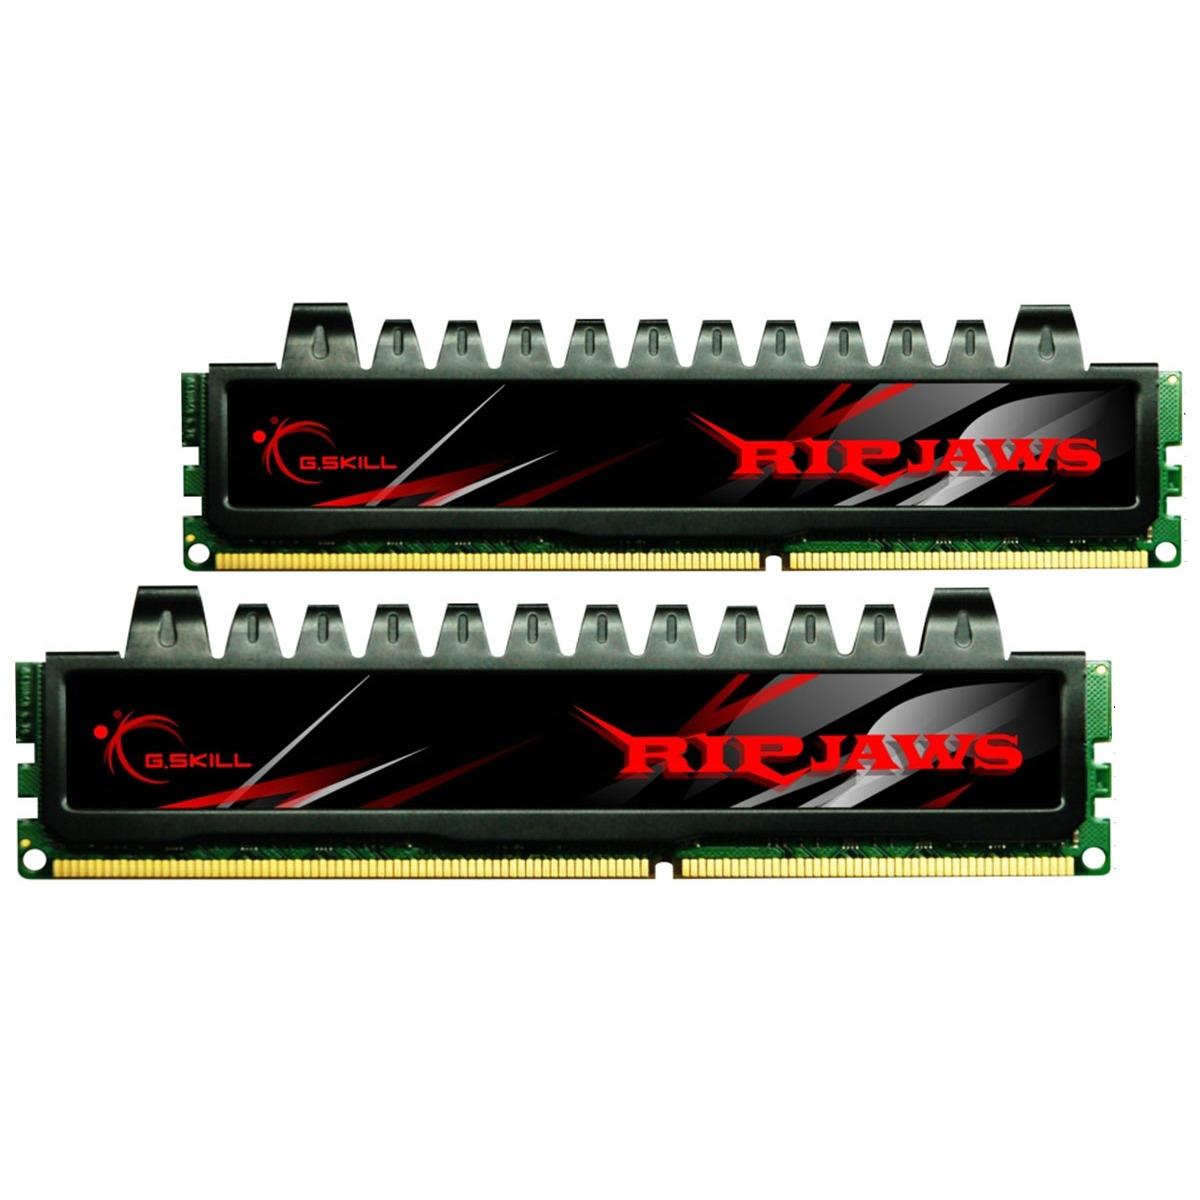 Mémoire PC G.Skill RH Series RipJaws 4 Go (2x 2Go) DDR3 1333 MHz G.Skill RH Series RipJaws 4 Go (kit 2x 2 Go) DDR3-SDRAM PC3-10666 - F3-10666CL7D-4GBRH (garantie 10 ans par G.Skill)